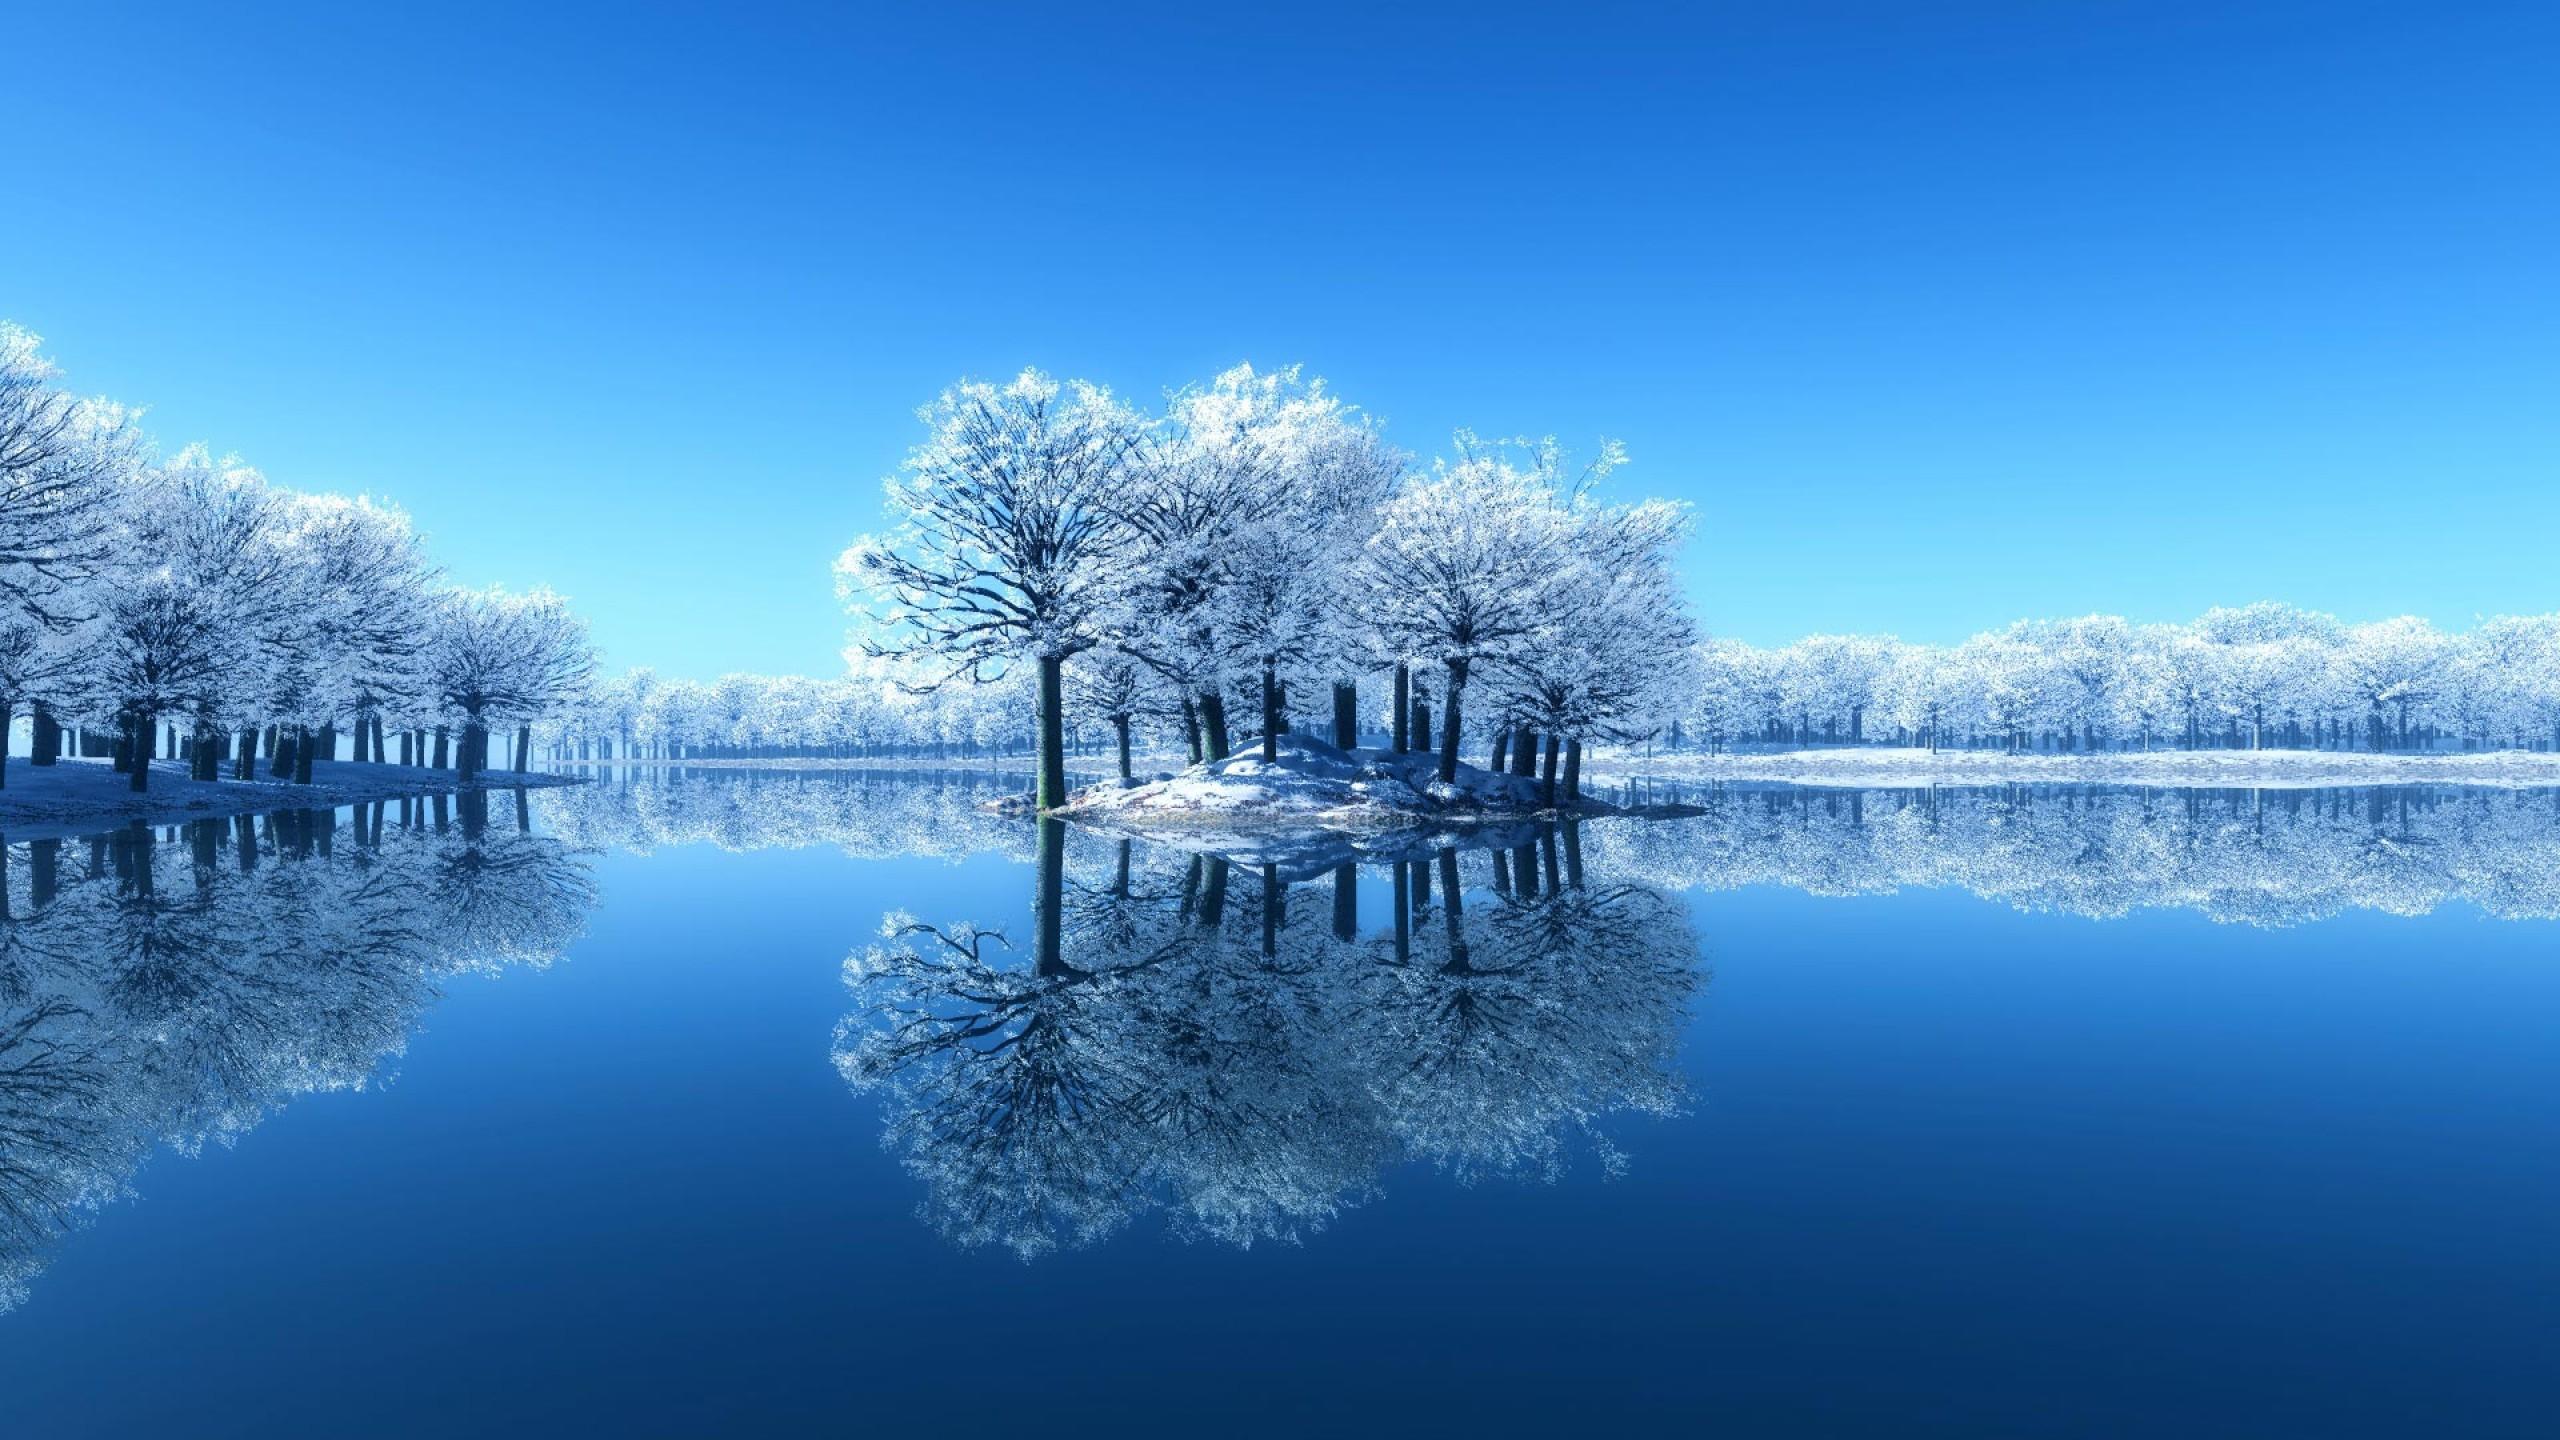 Winter Lake wallpaper - 1048975